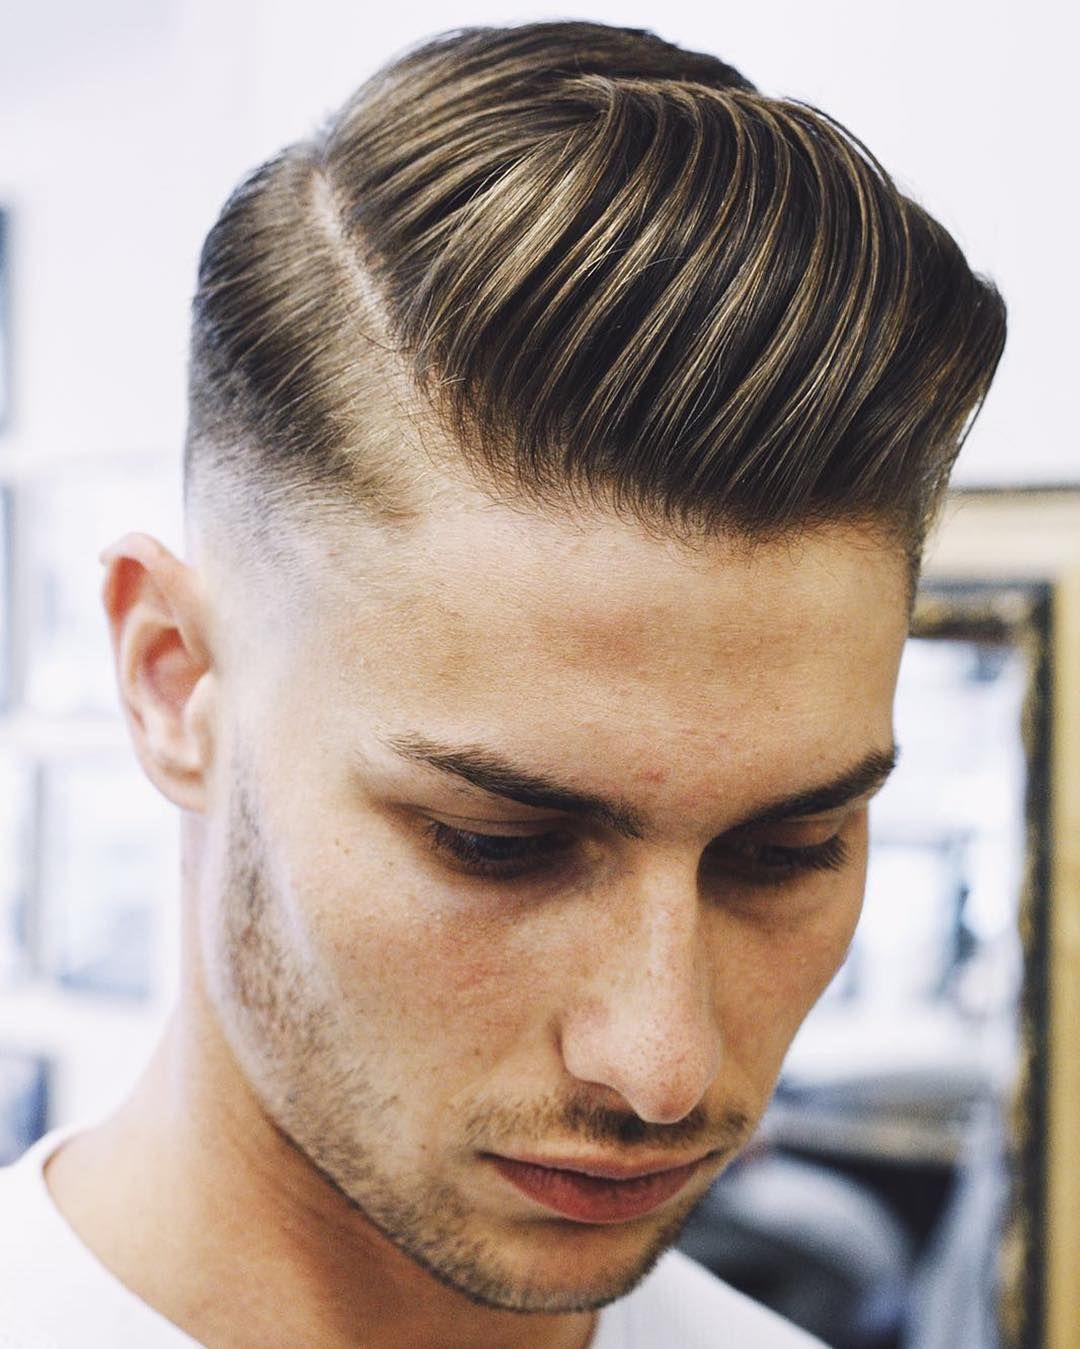 25 popular haircuts for men 2017 | popular haircuts, haircuts and